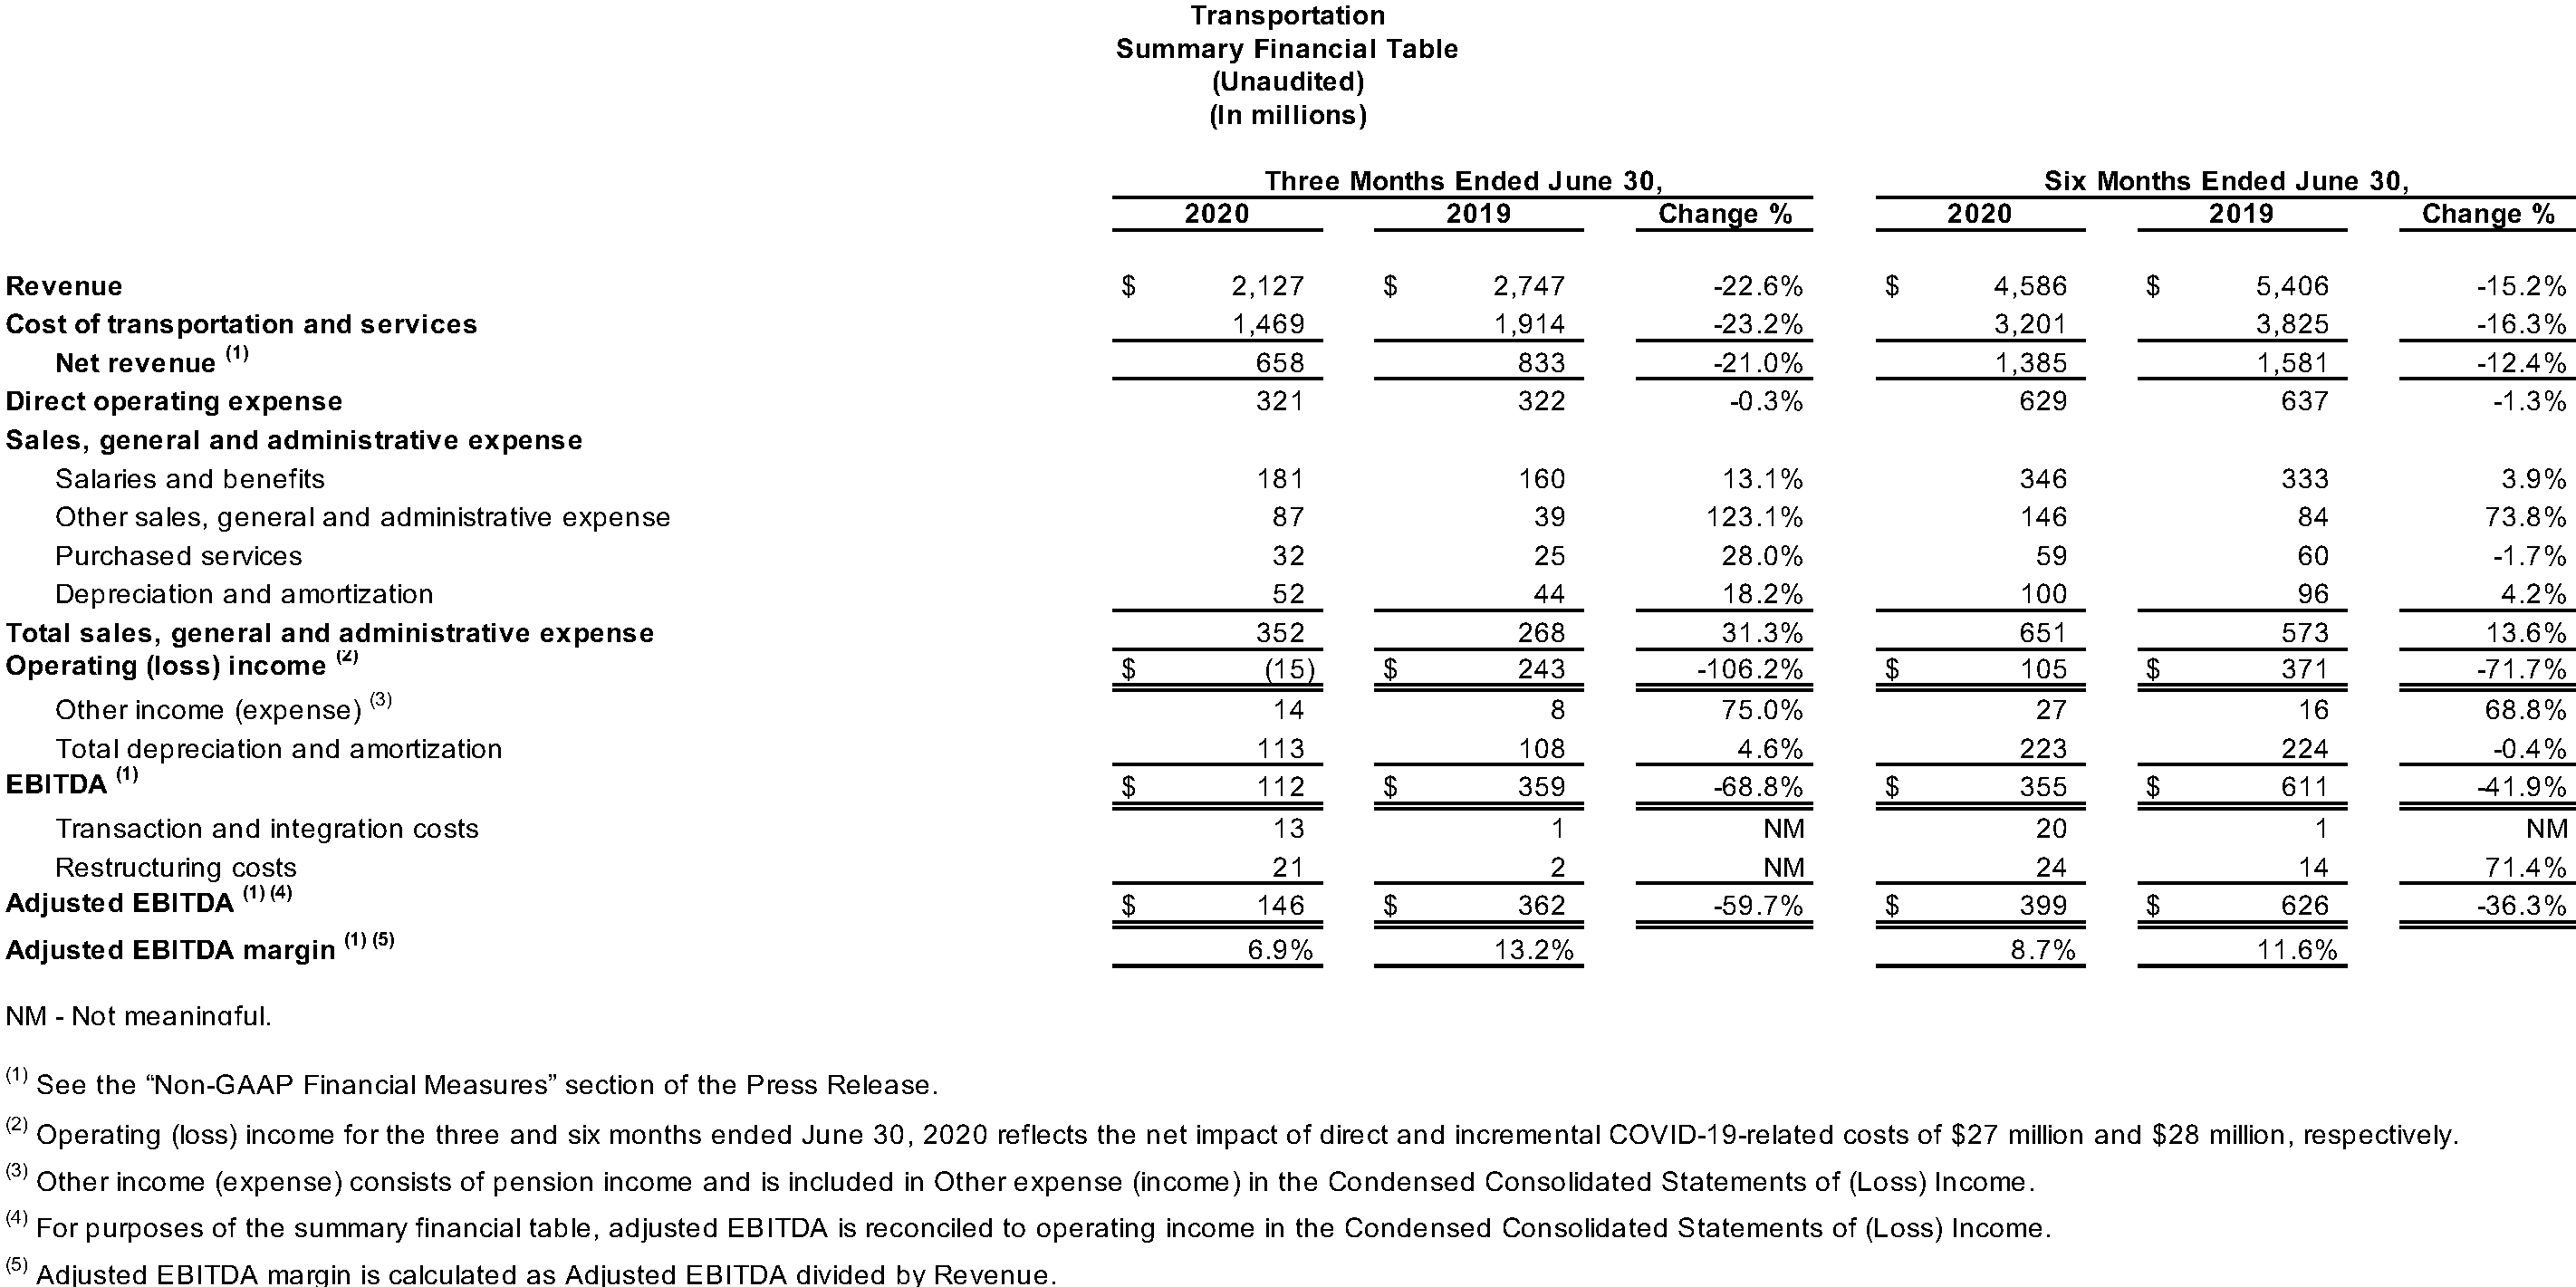 Transportation Summary Financial Table